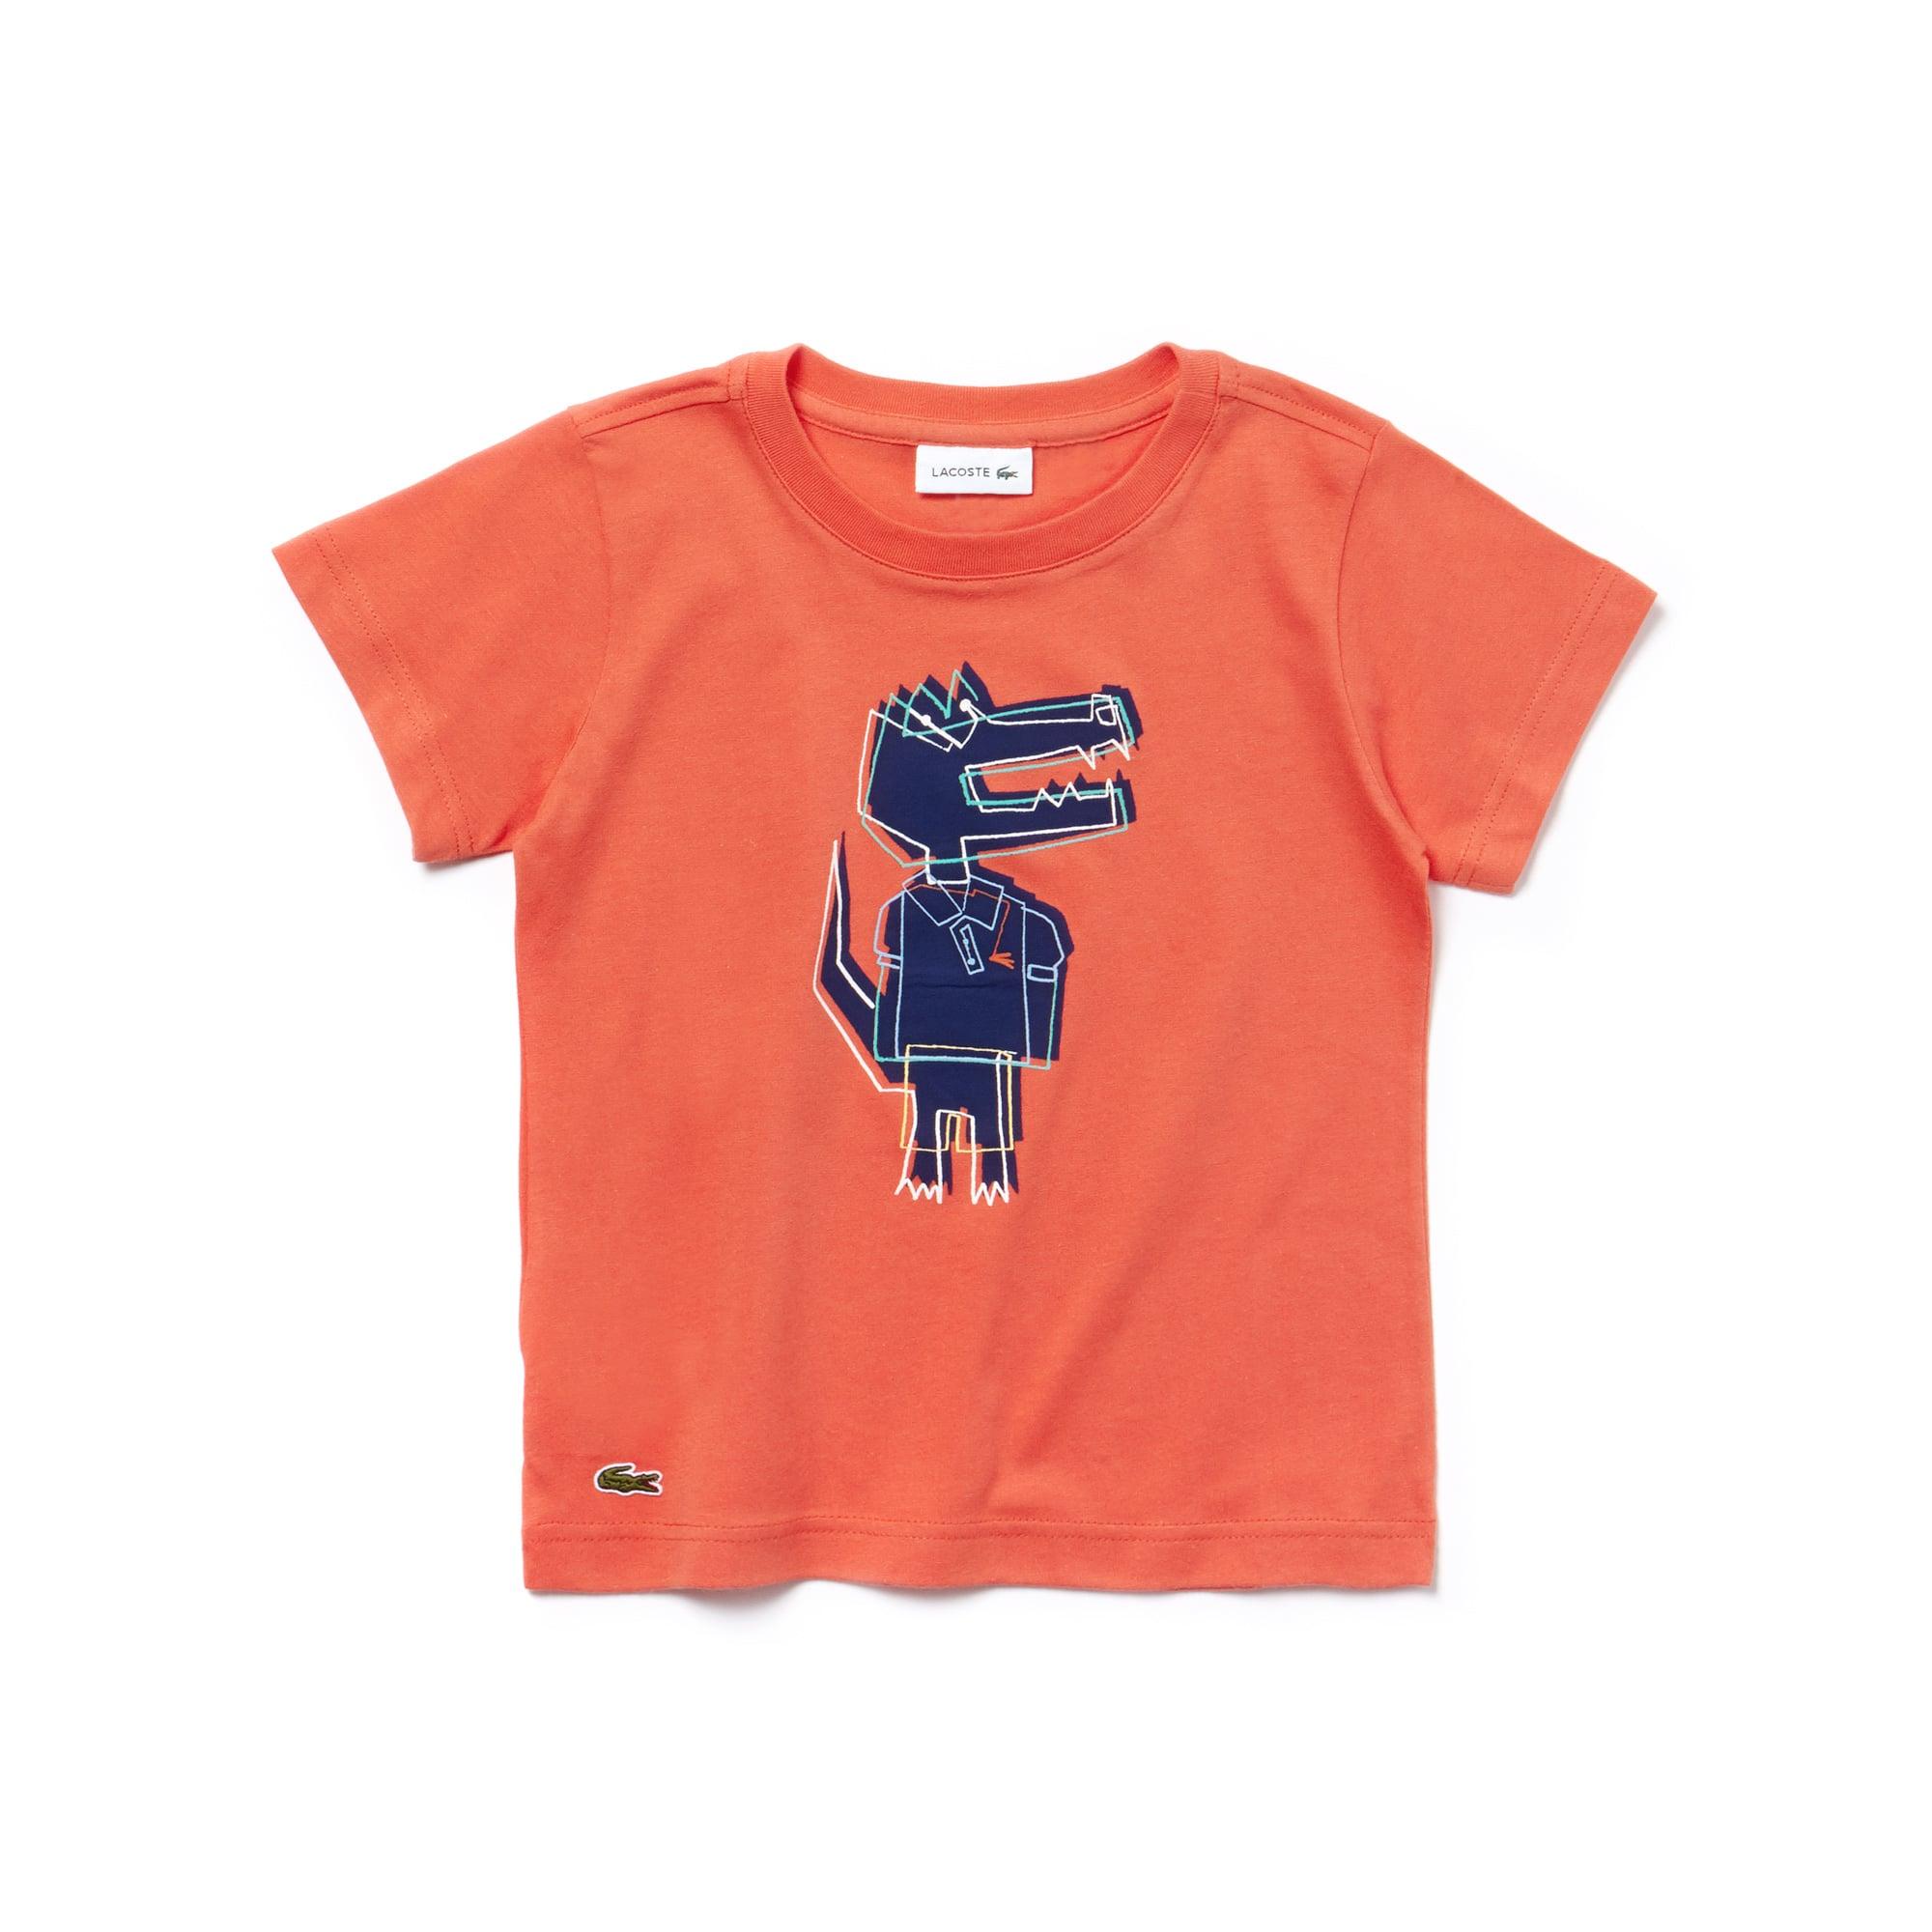 Boys' Crew Neck Crocodile Print Jersey T-shirt